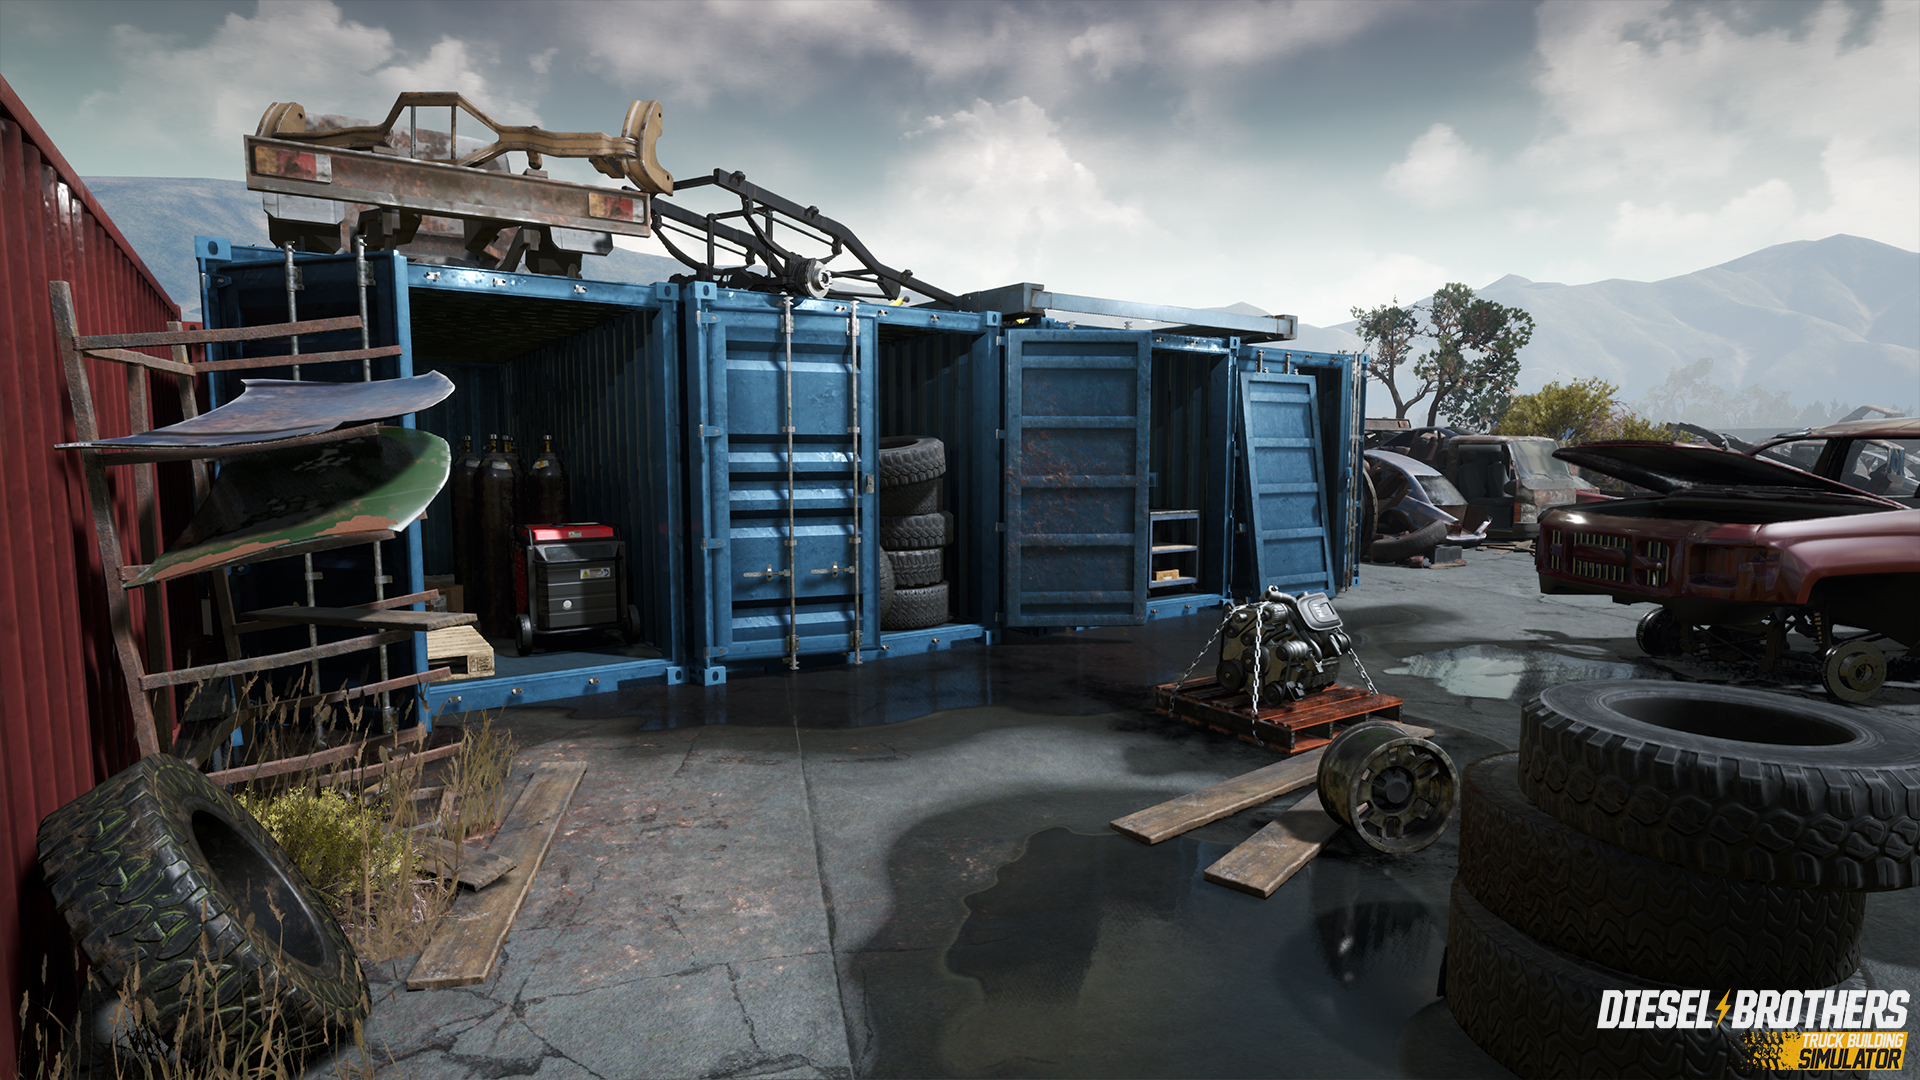 Diesel Brothers: Truck Building Simulator screenshot